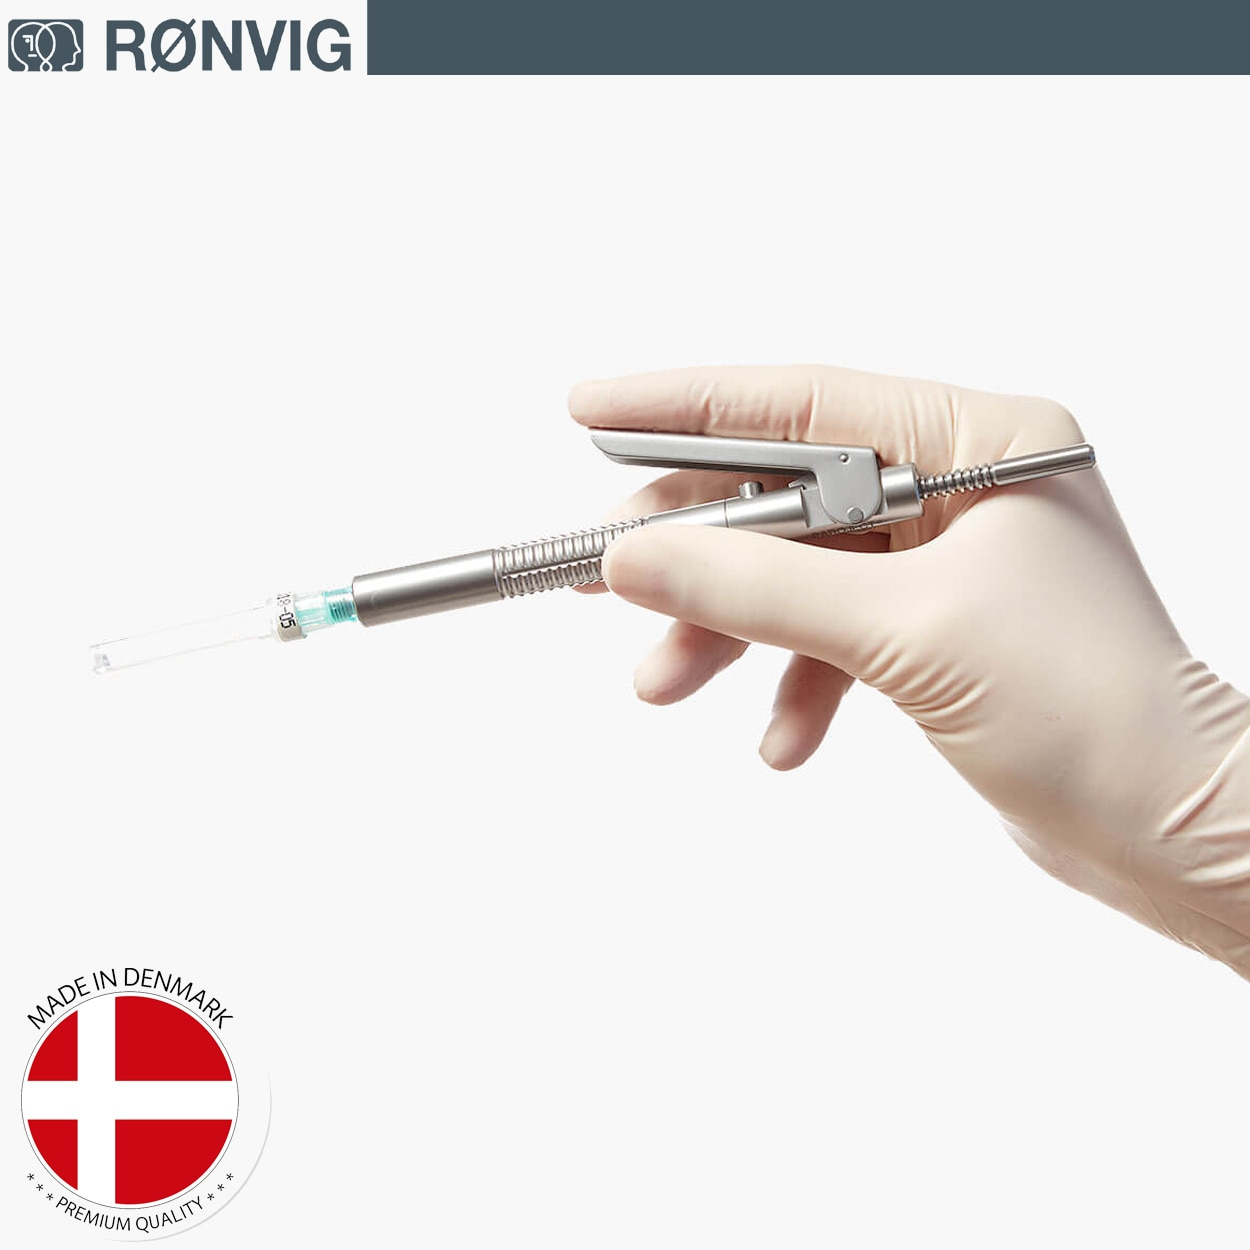 Ronvig Paroject Dental cartridge syringe for intraligamental  - PDLA